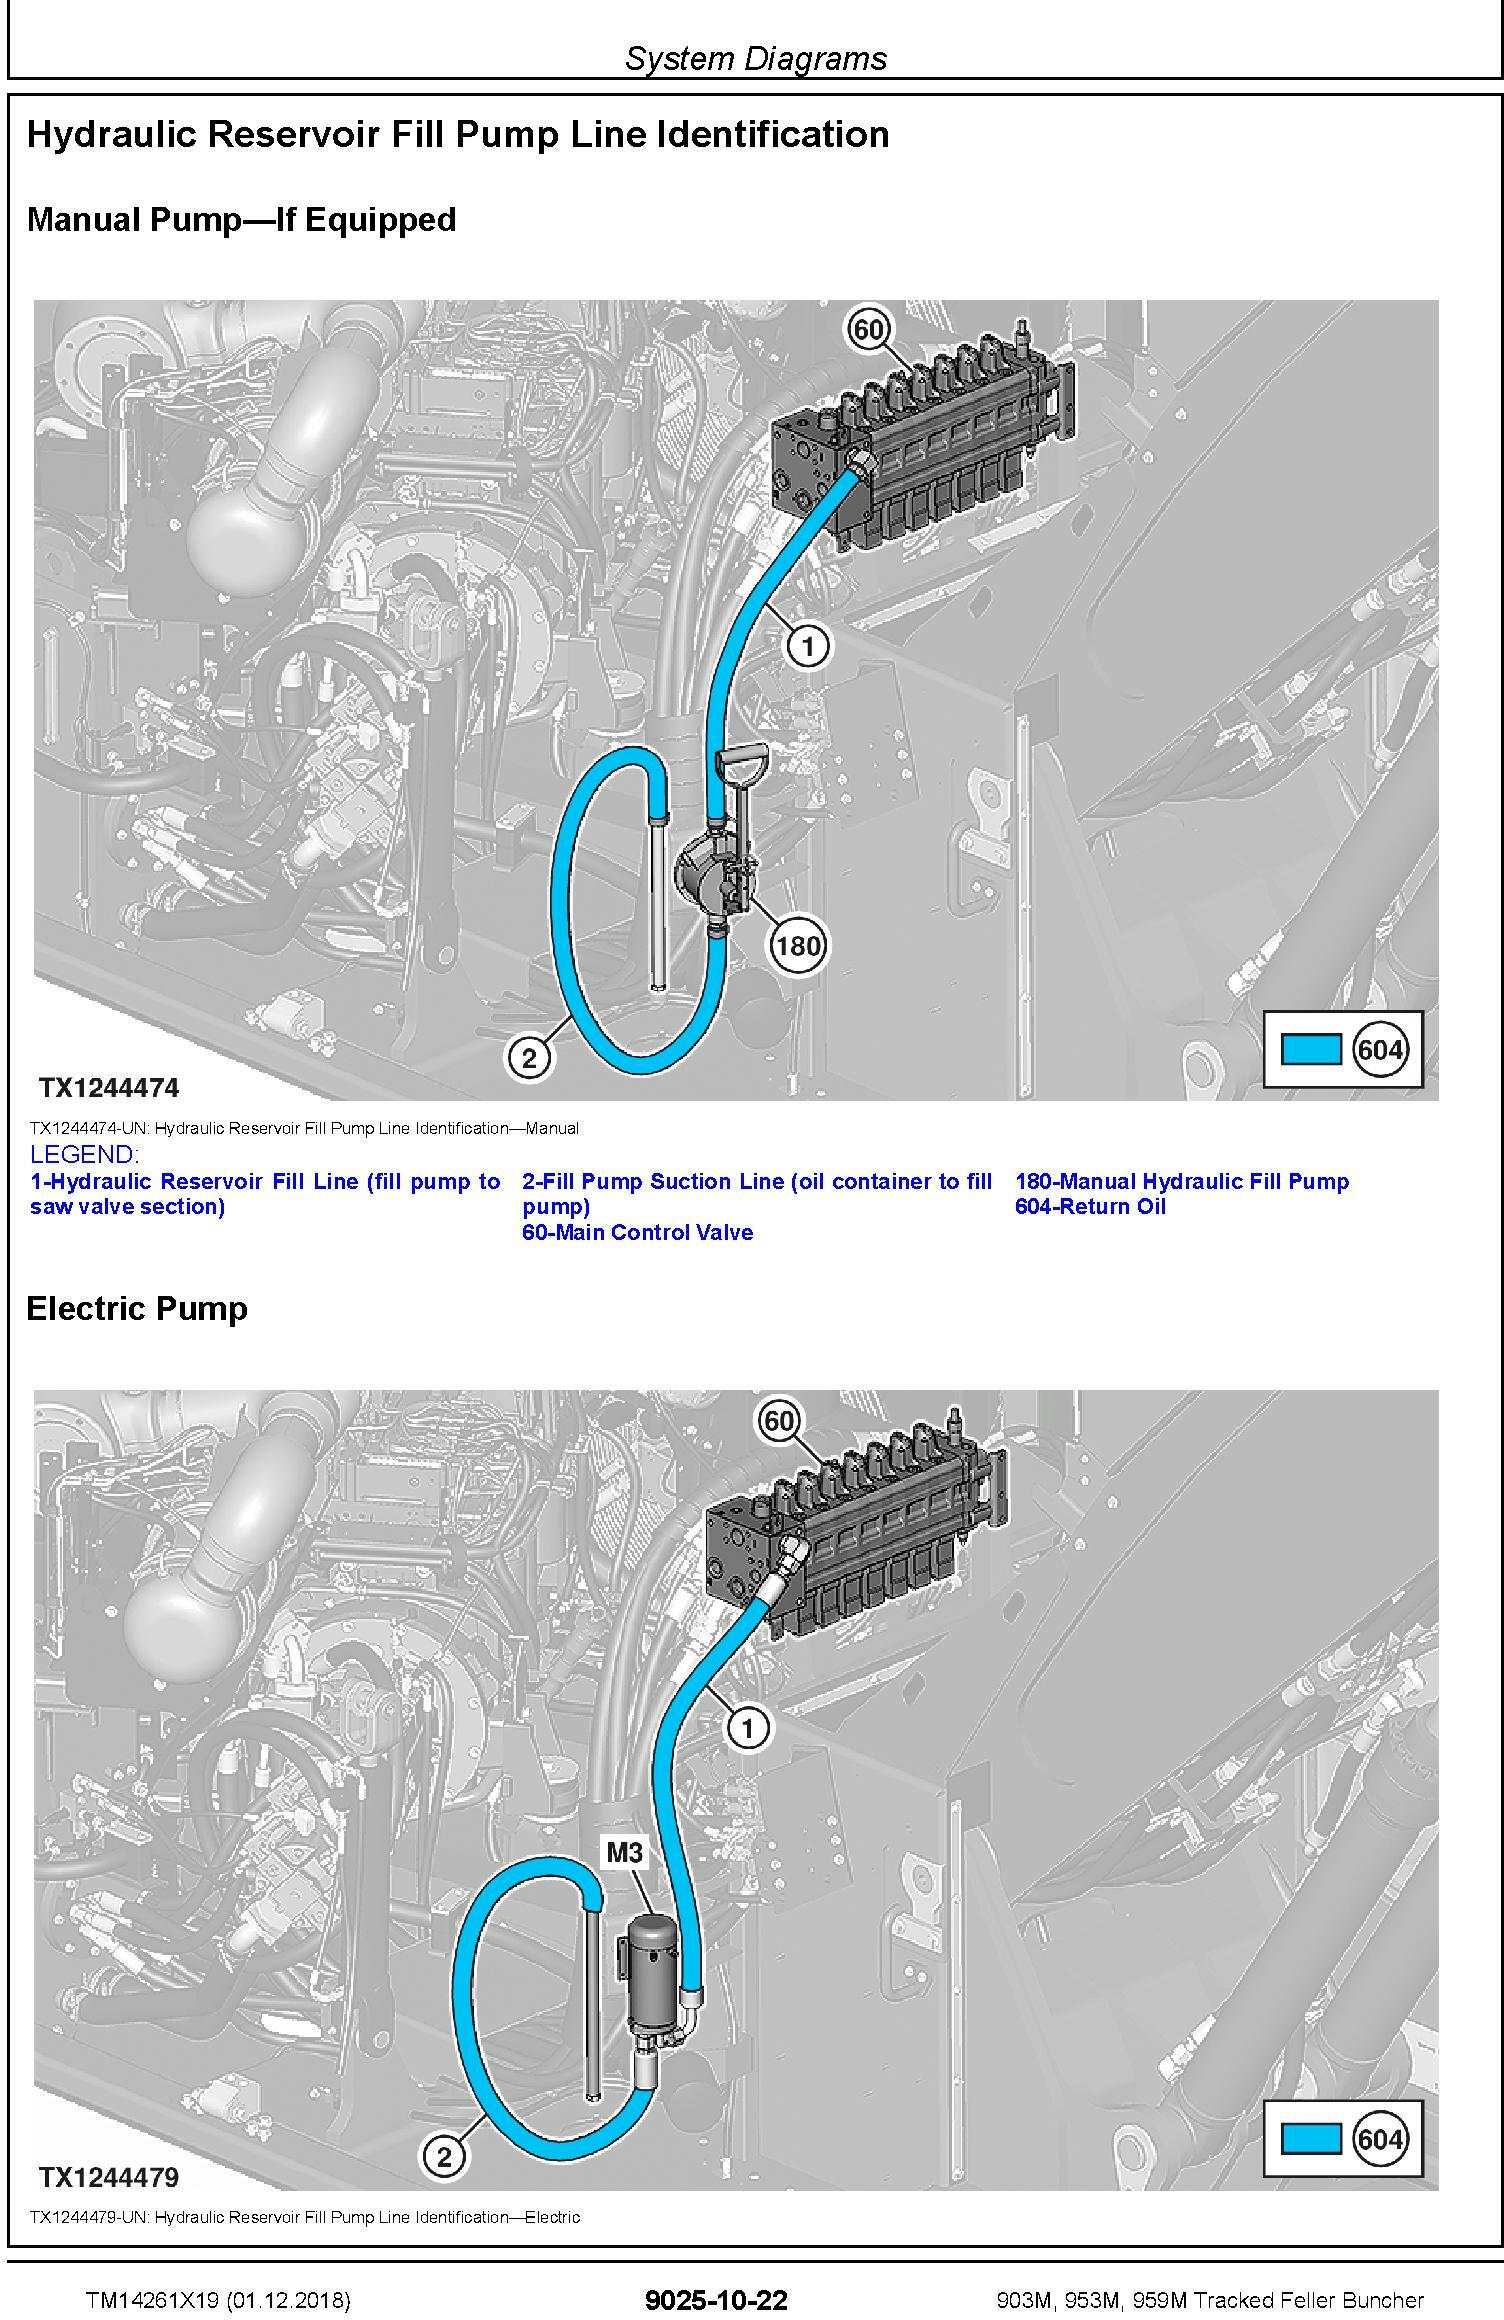 John Deere 903M, 953M, 959M (SN. F317982-, L317982-) Feller Buncher Diagnostic Manual (TM14261X19) - 2